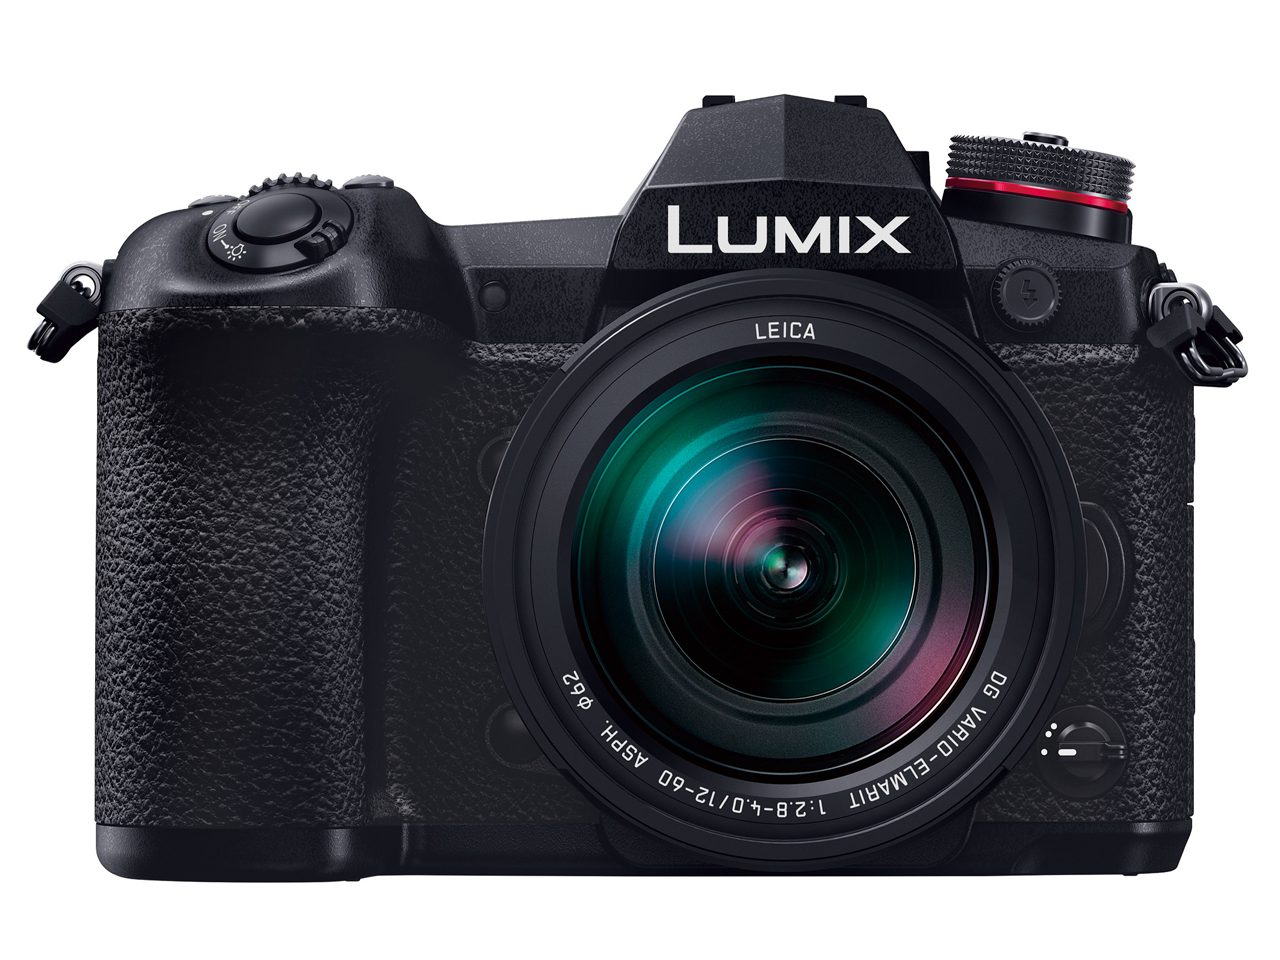 LUMIX DC-G9L 標準ズームライカDGレンズキット の製品画像